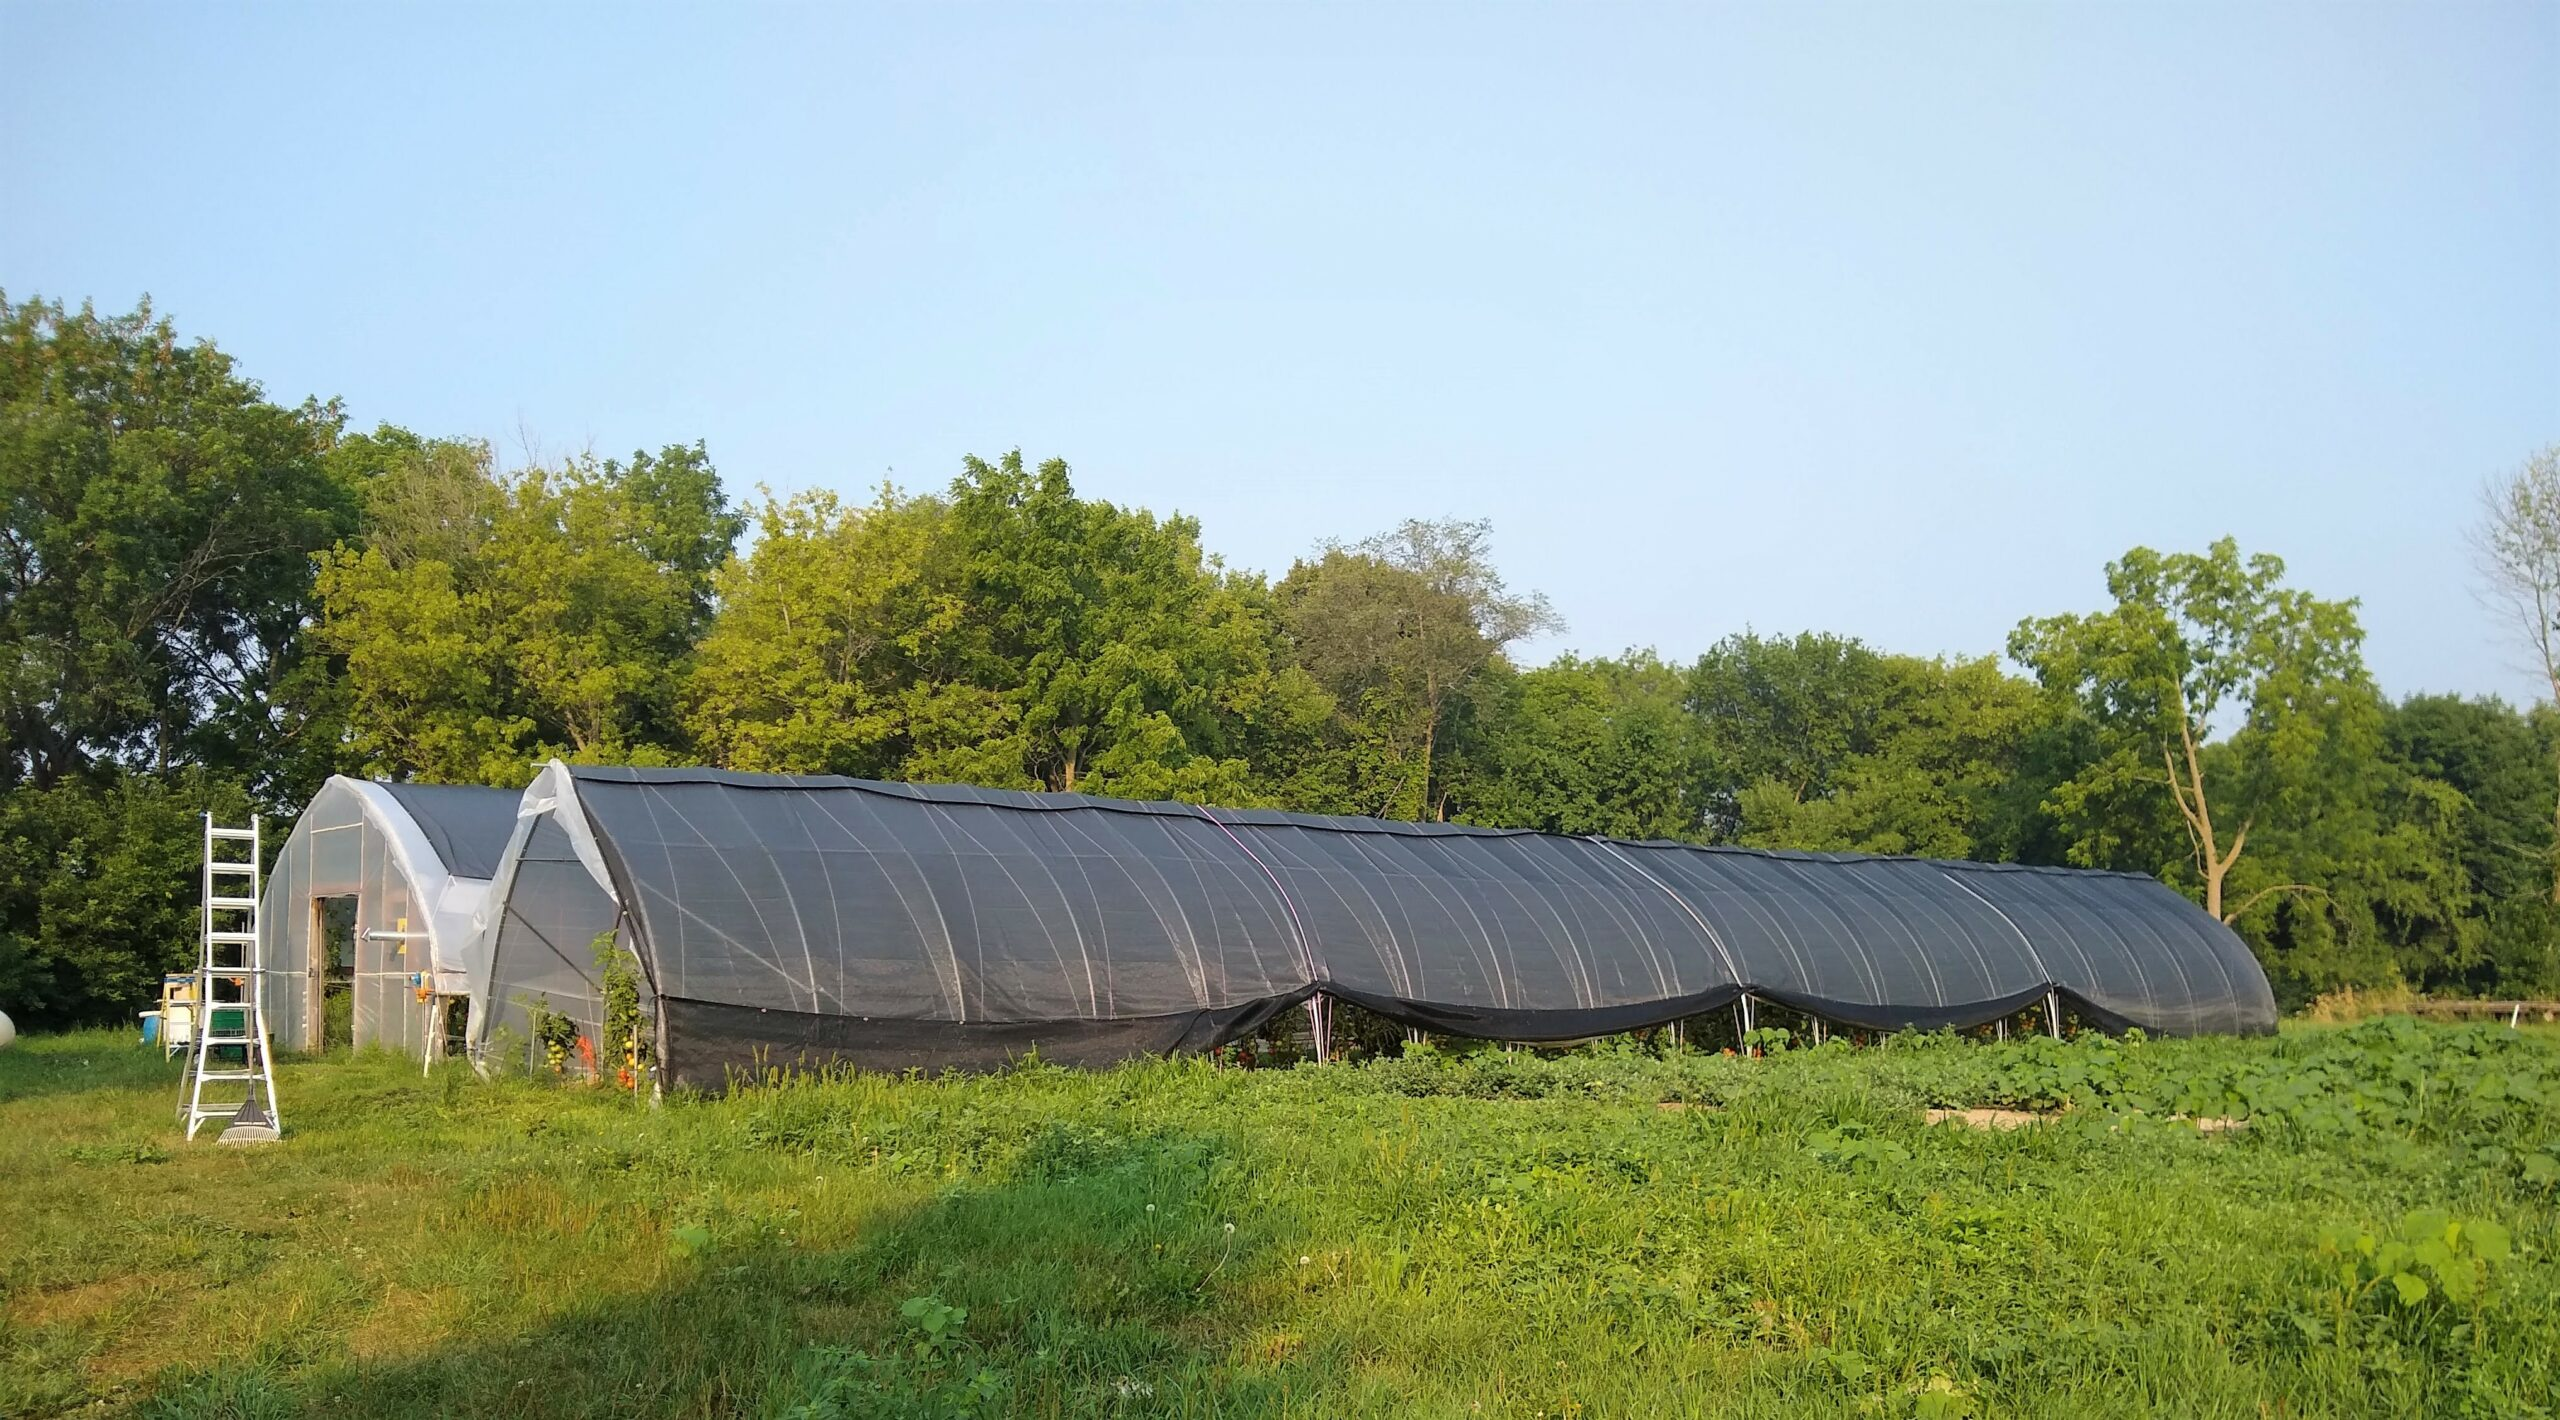 Nistler Farms Greenhouses